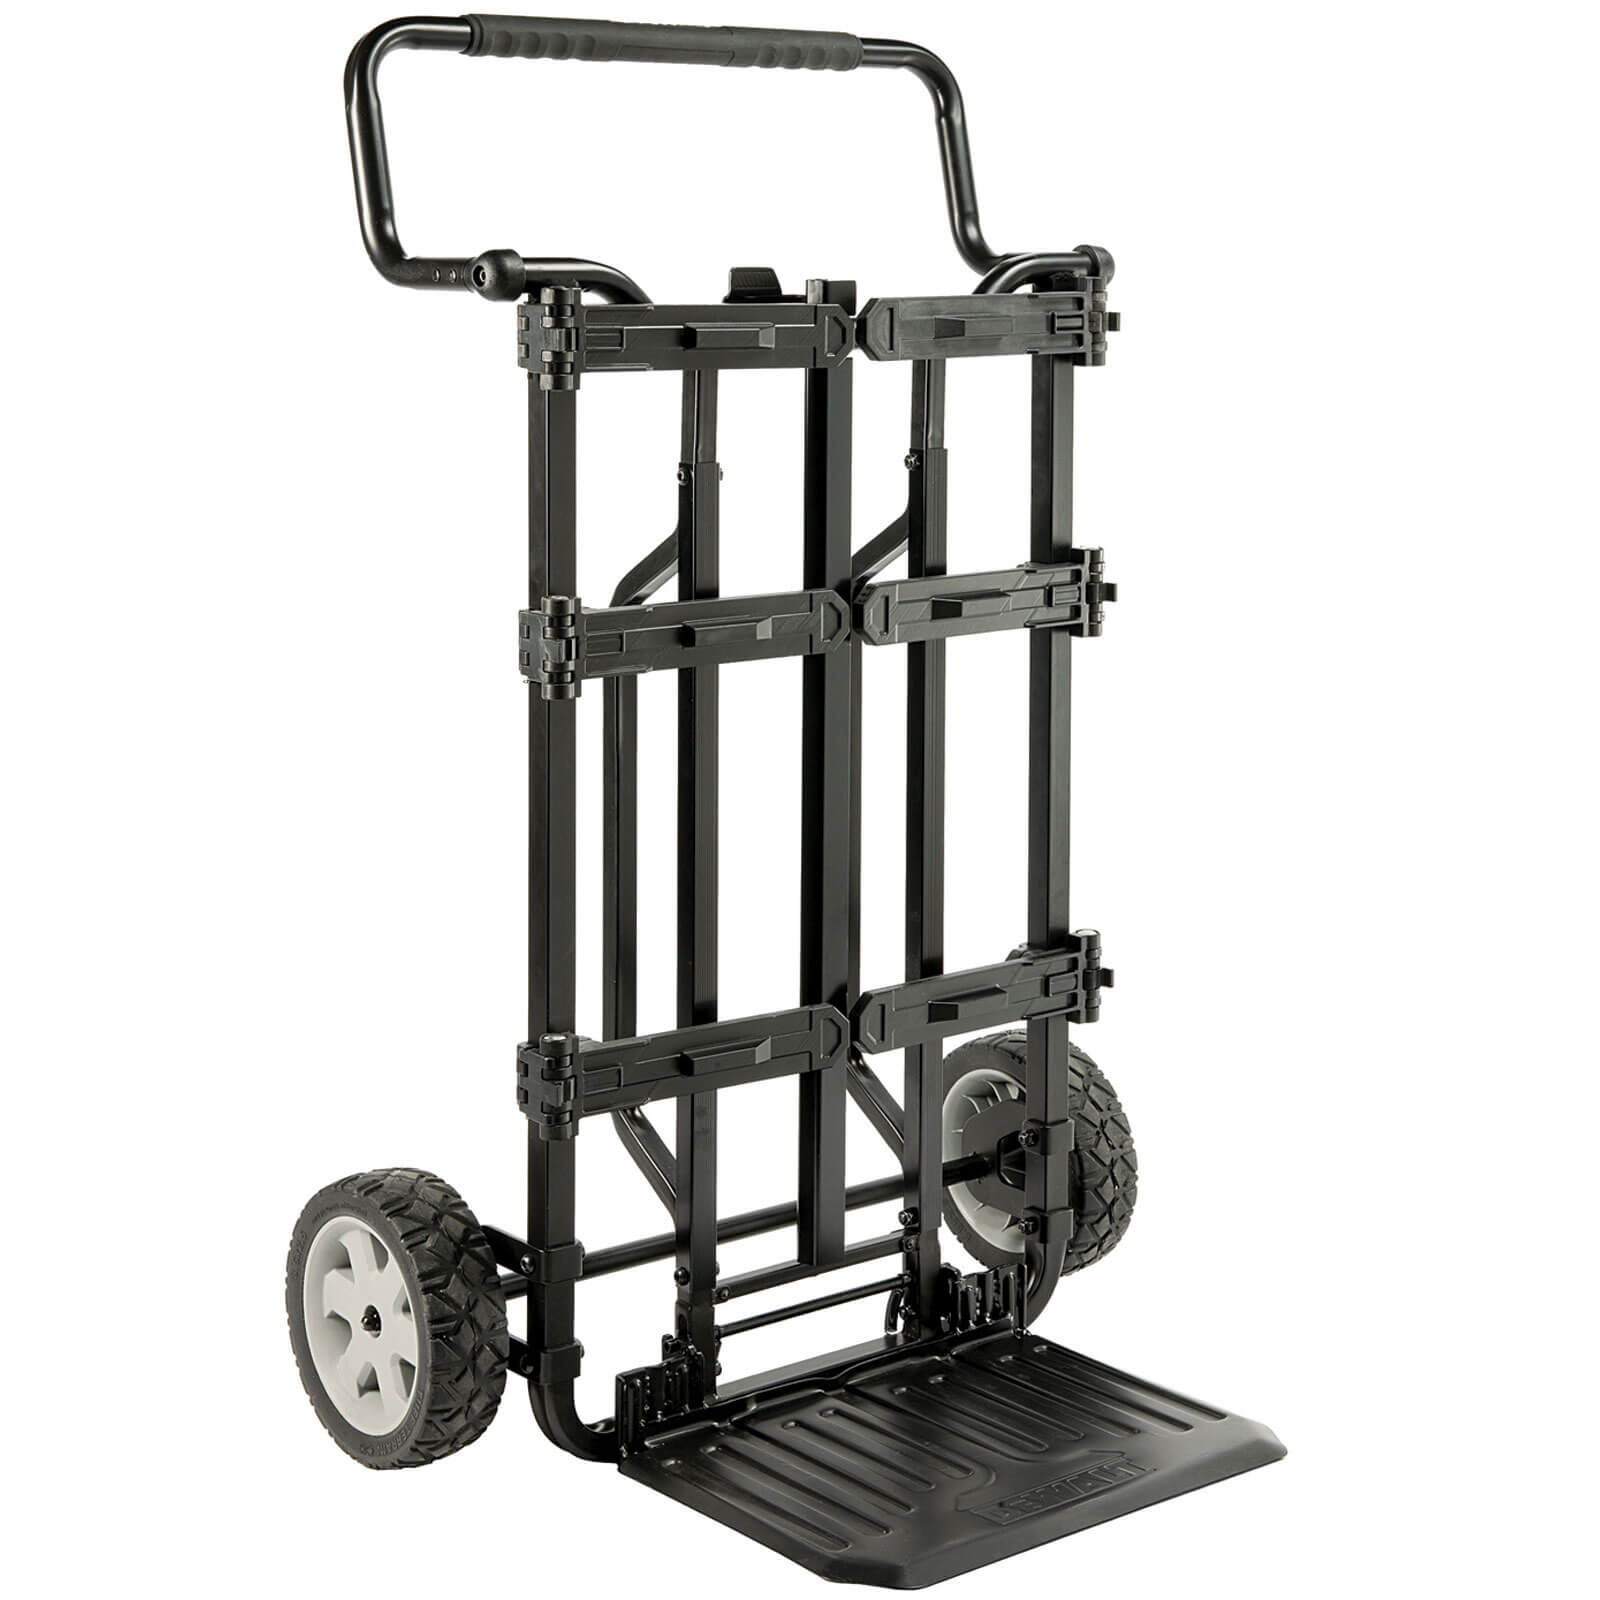 DEWALT tough système trolley 1-70-324 tough système